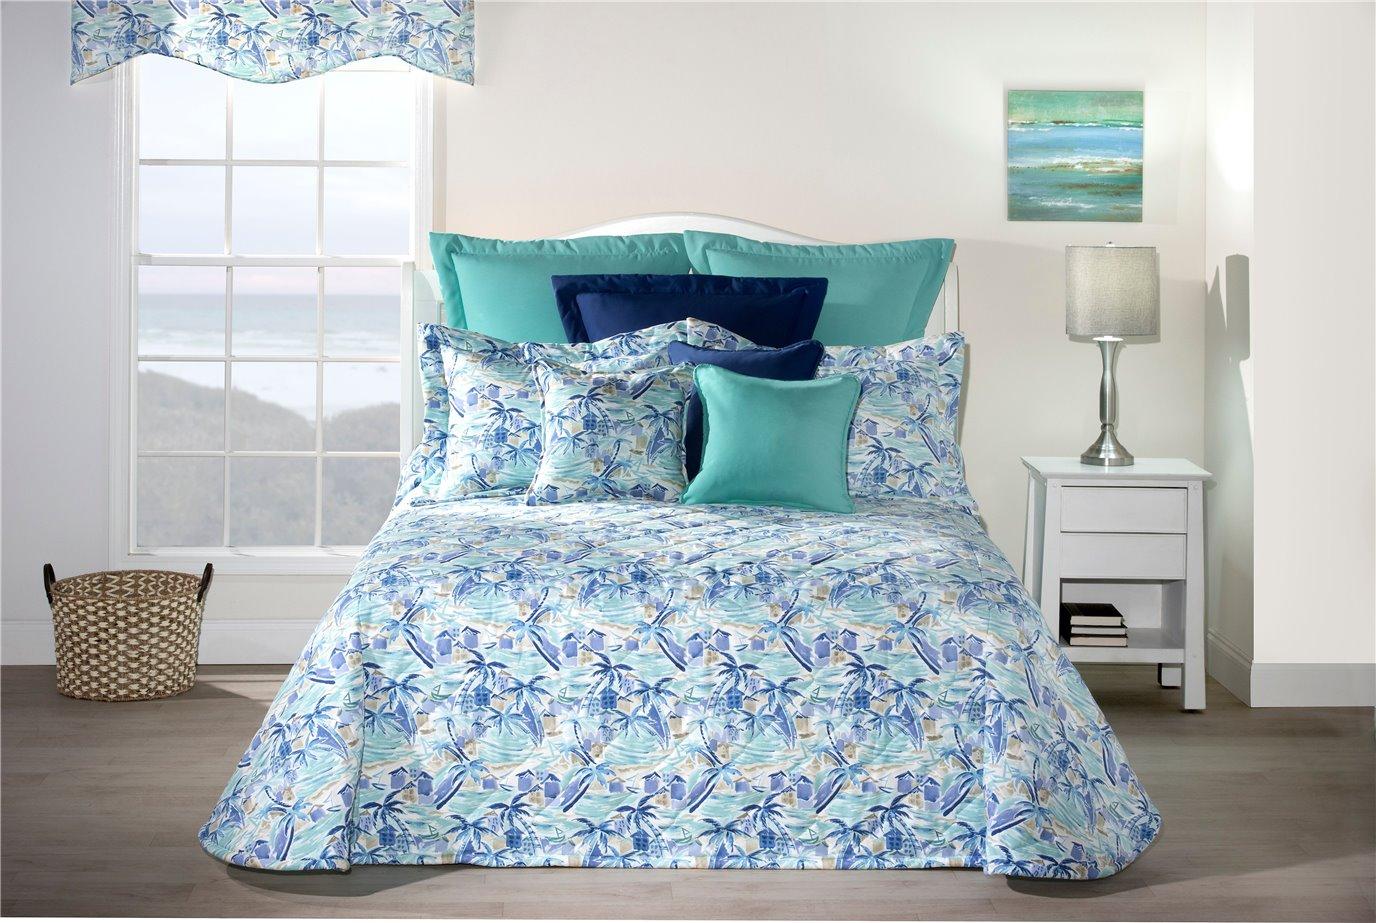 Tropical Paradise Blue Twin Bedspread